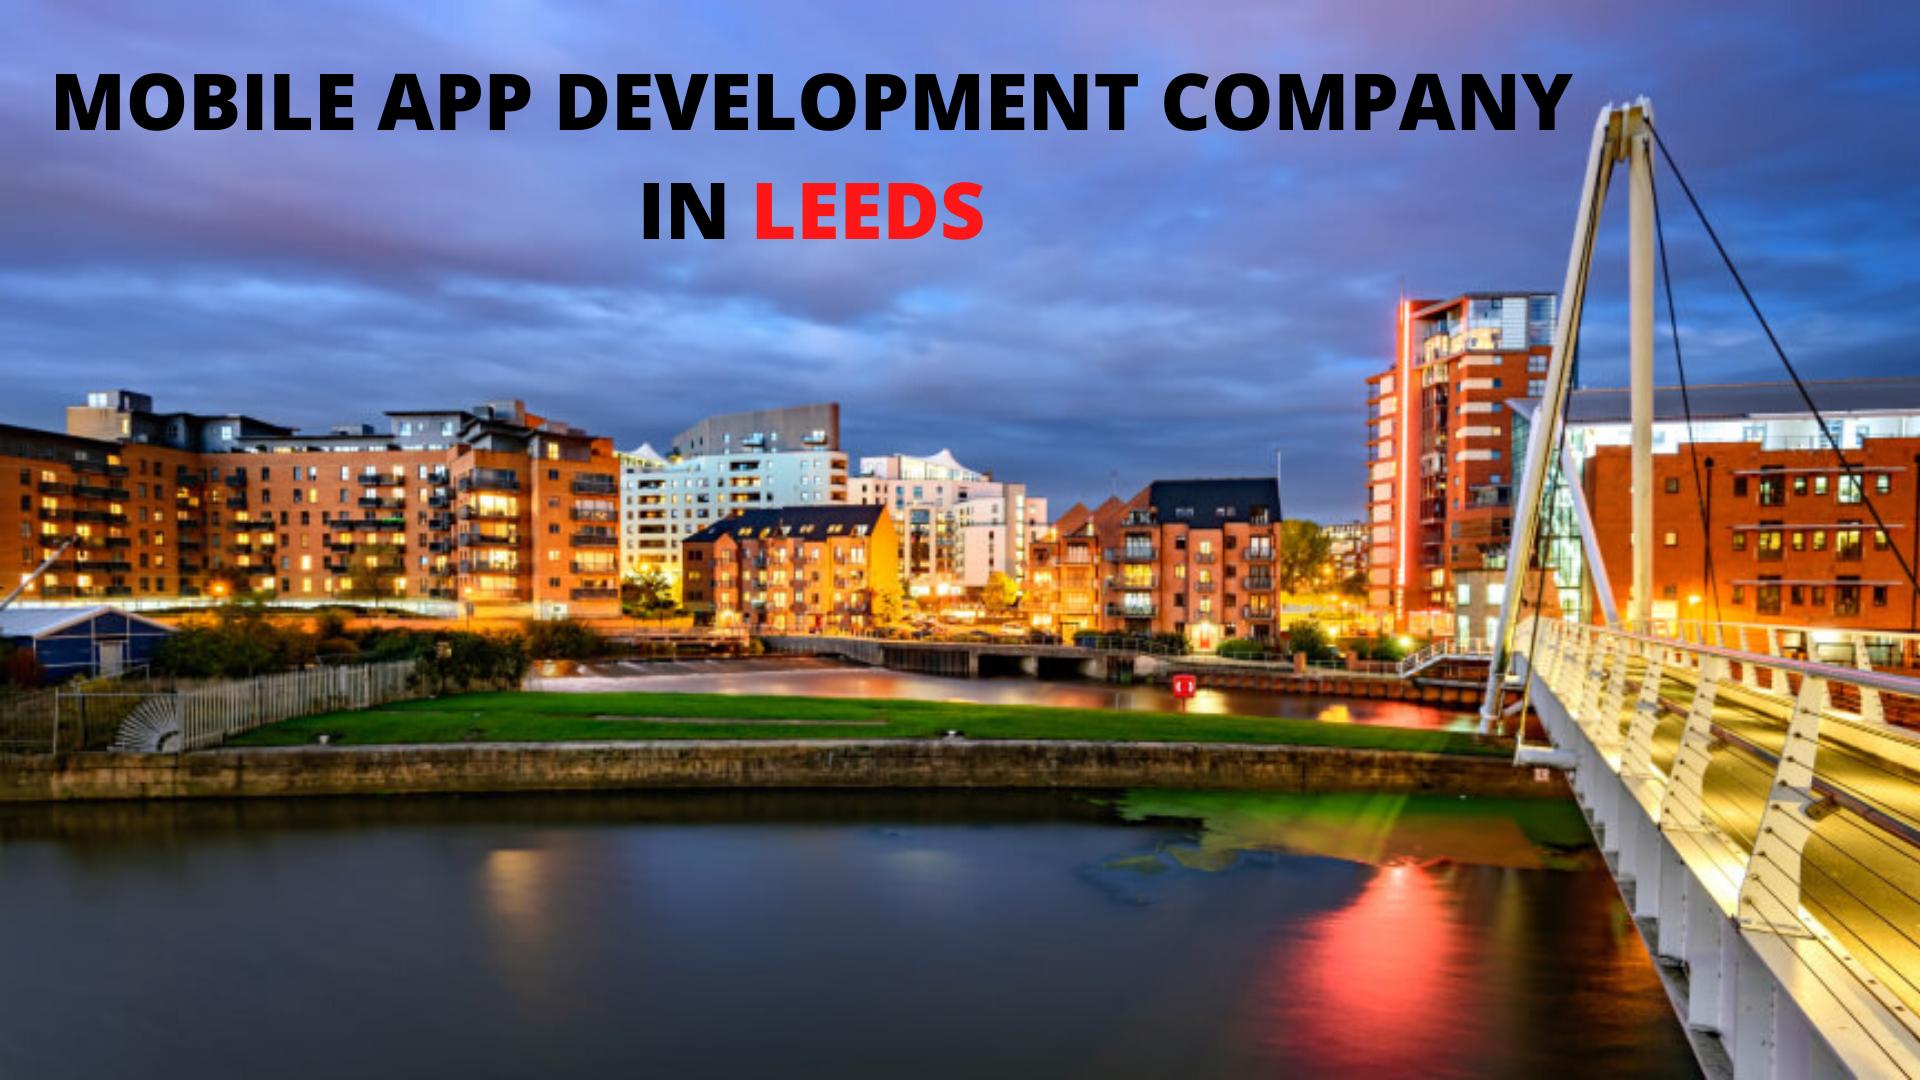 Mobile App Development Company in Leeds - WebClues Infotech